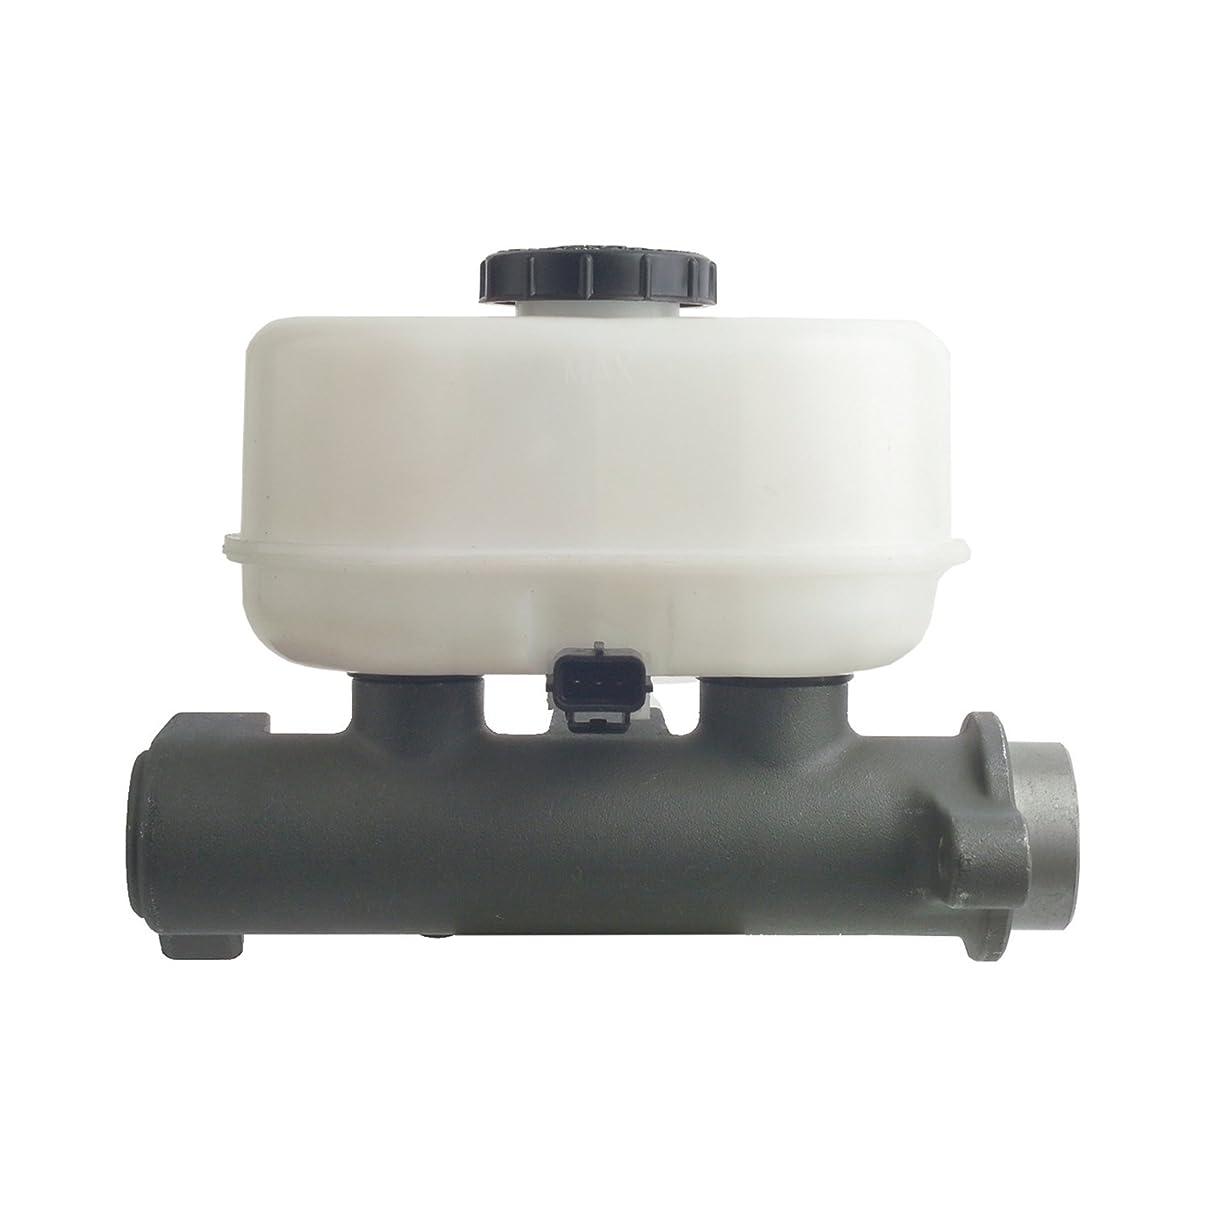 Cardone Select 13-2884 New Brake Master Cylinder g54561950942310